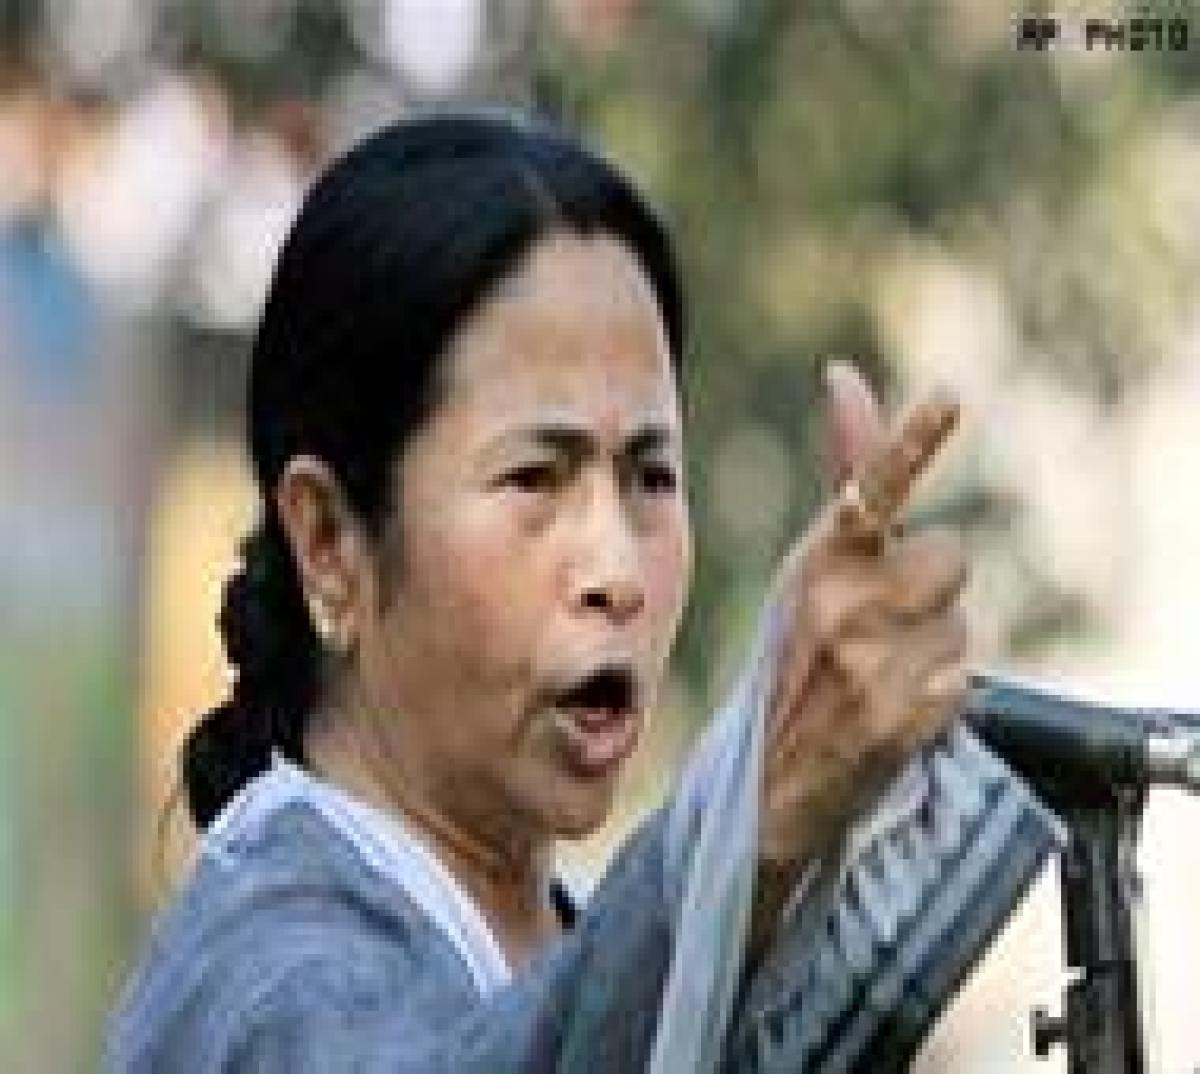 Trinamool to conduct internal probe into Narada sting